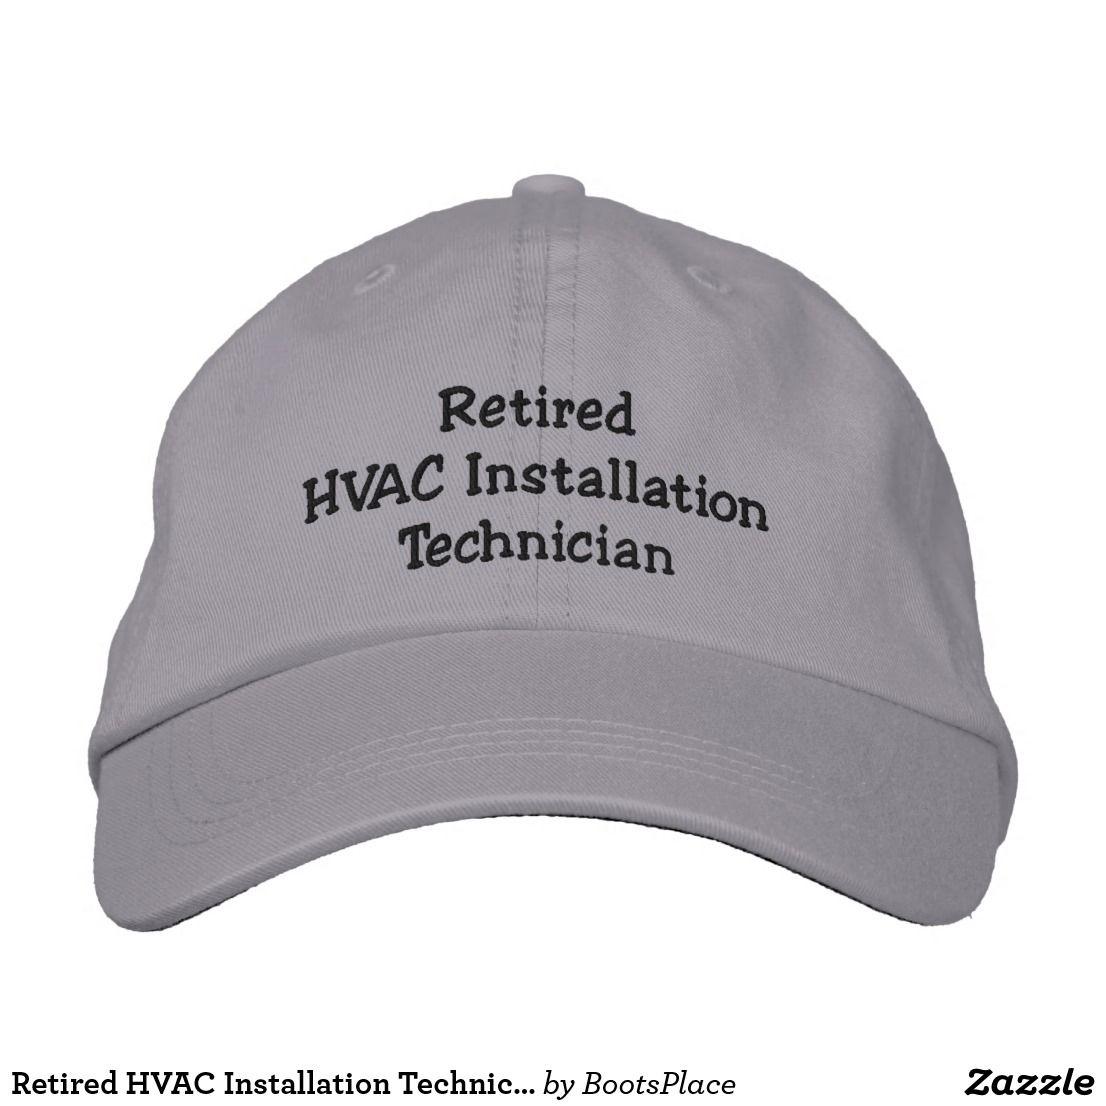 Retired Hvac Installation Technician Embroidered Baseball Cap Zazzle Com Embroidered Baseball Caps Baseball Cap Baseball Hats